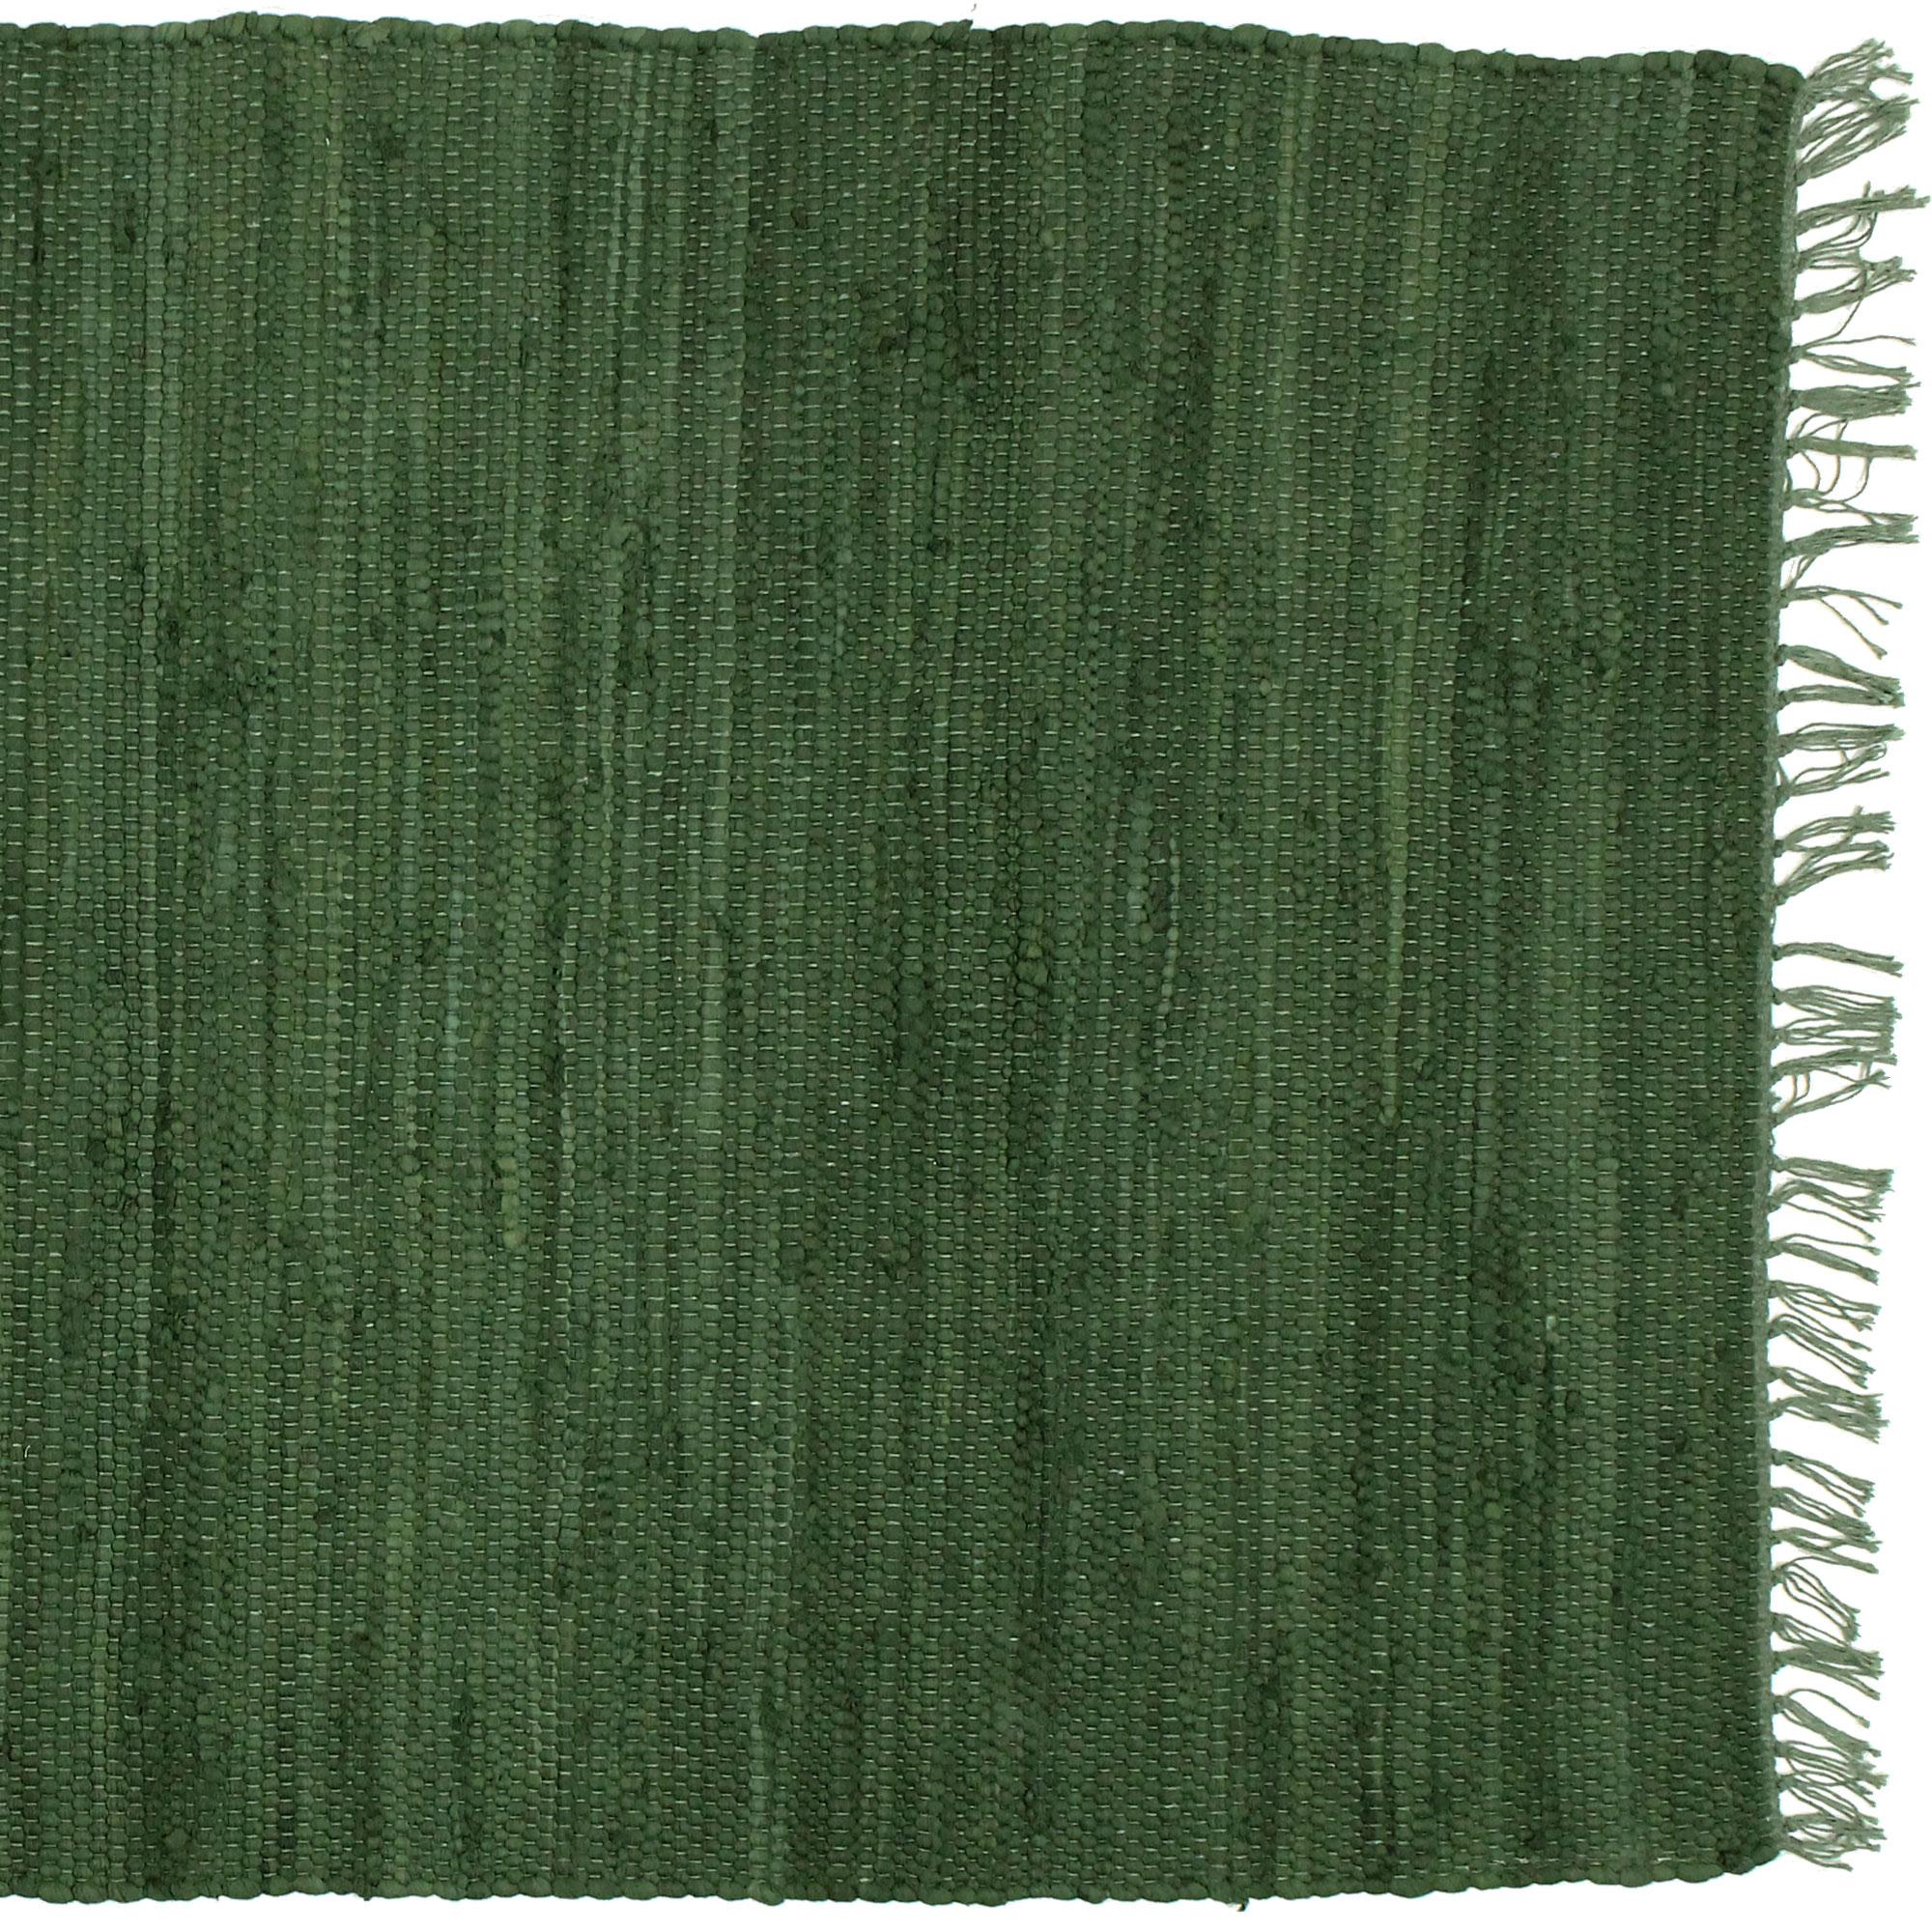 Bristol rag rugs 2x3 6 9 ebay for Garden room 2x3